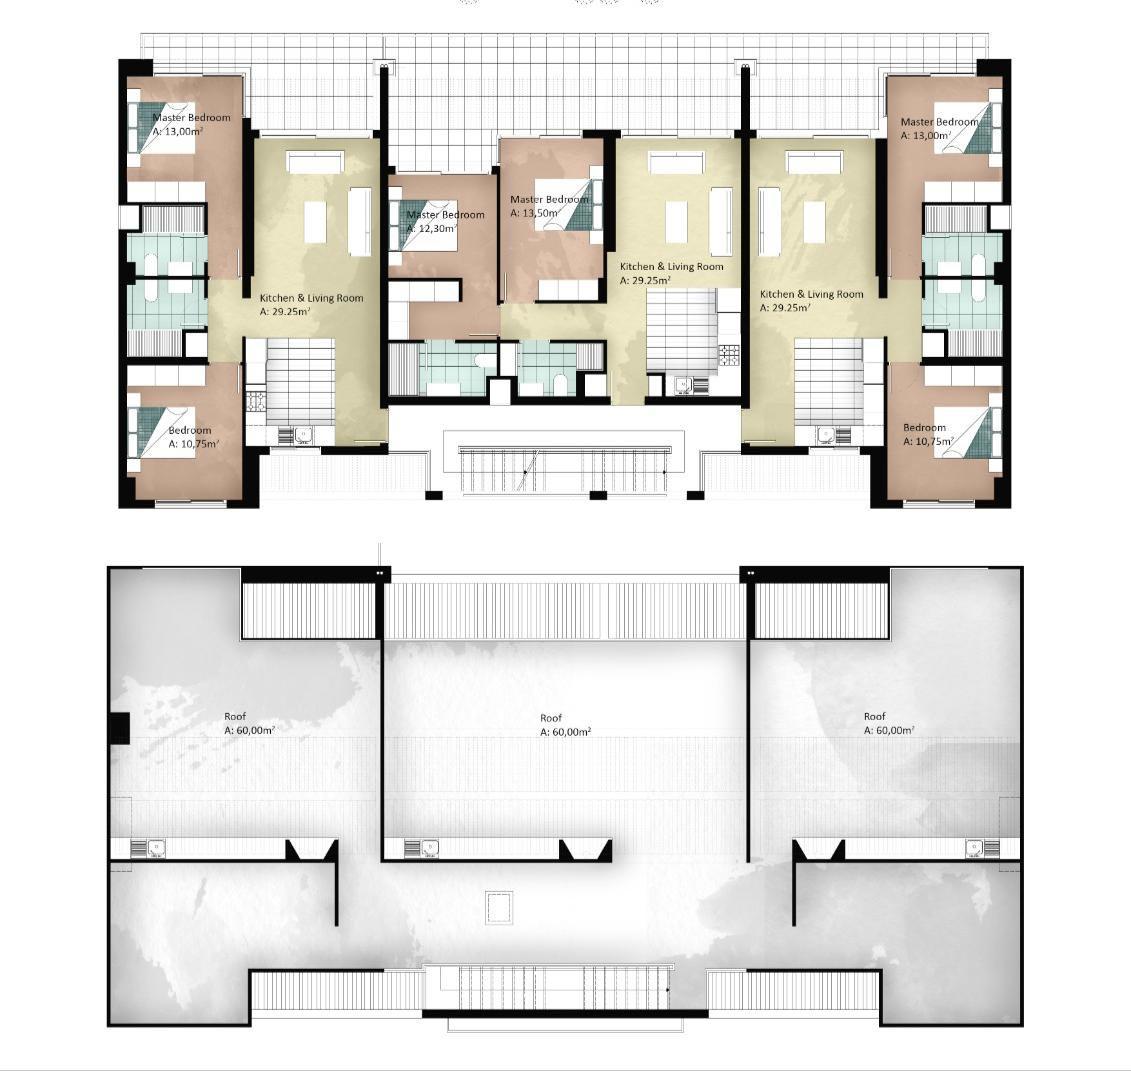 Block 8 & 9 - 2 bedroom penthouse